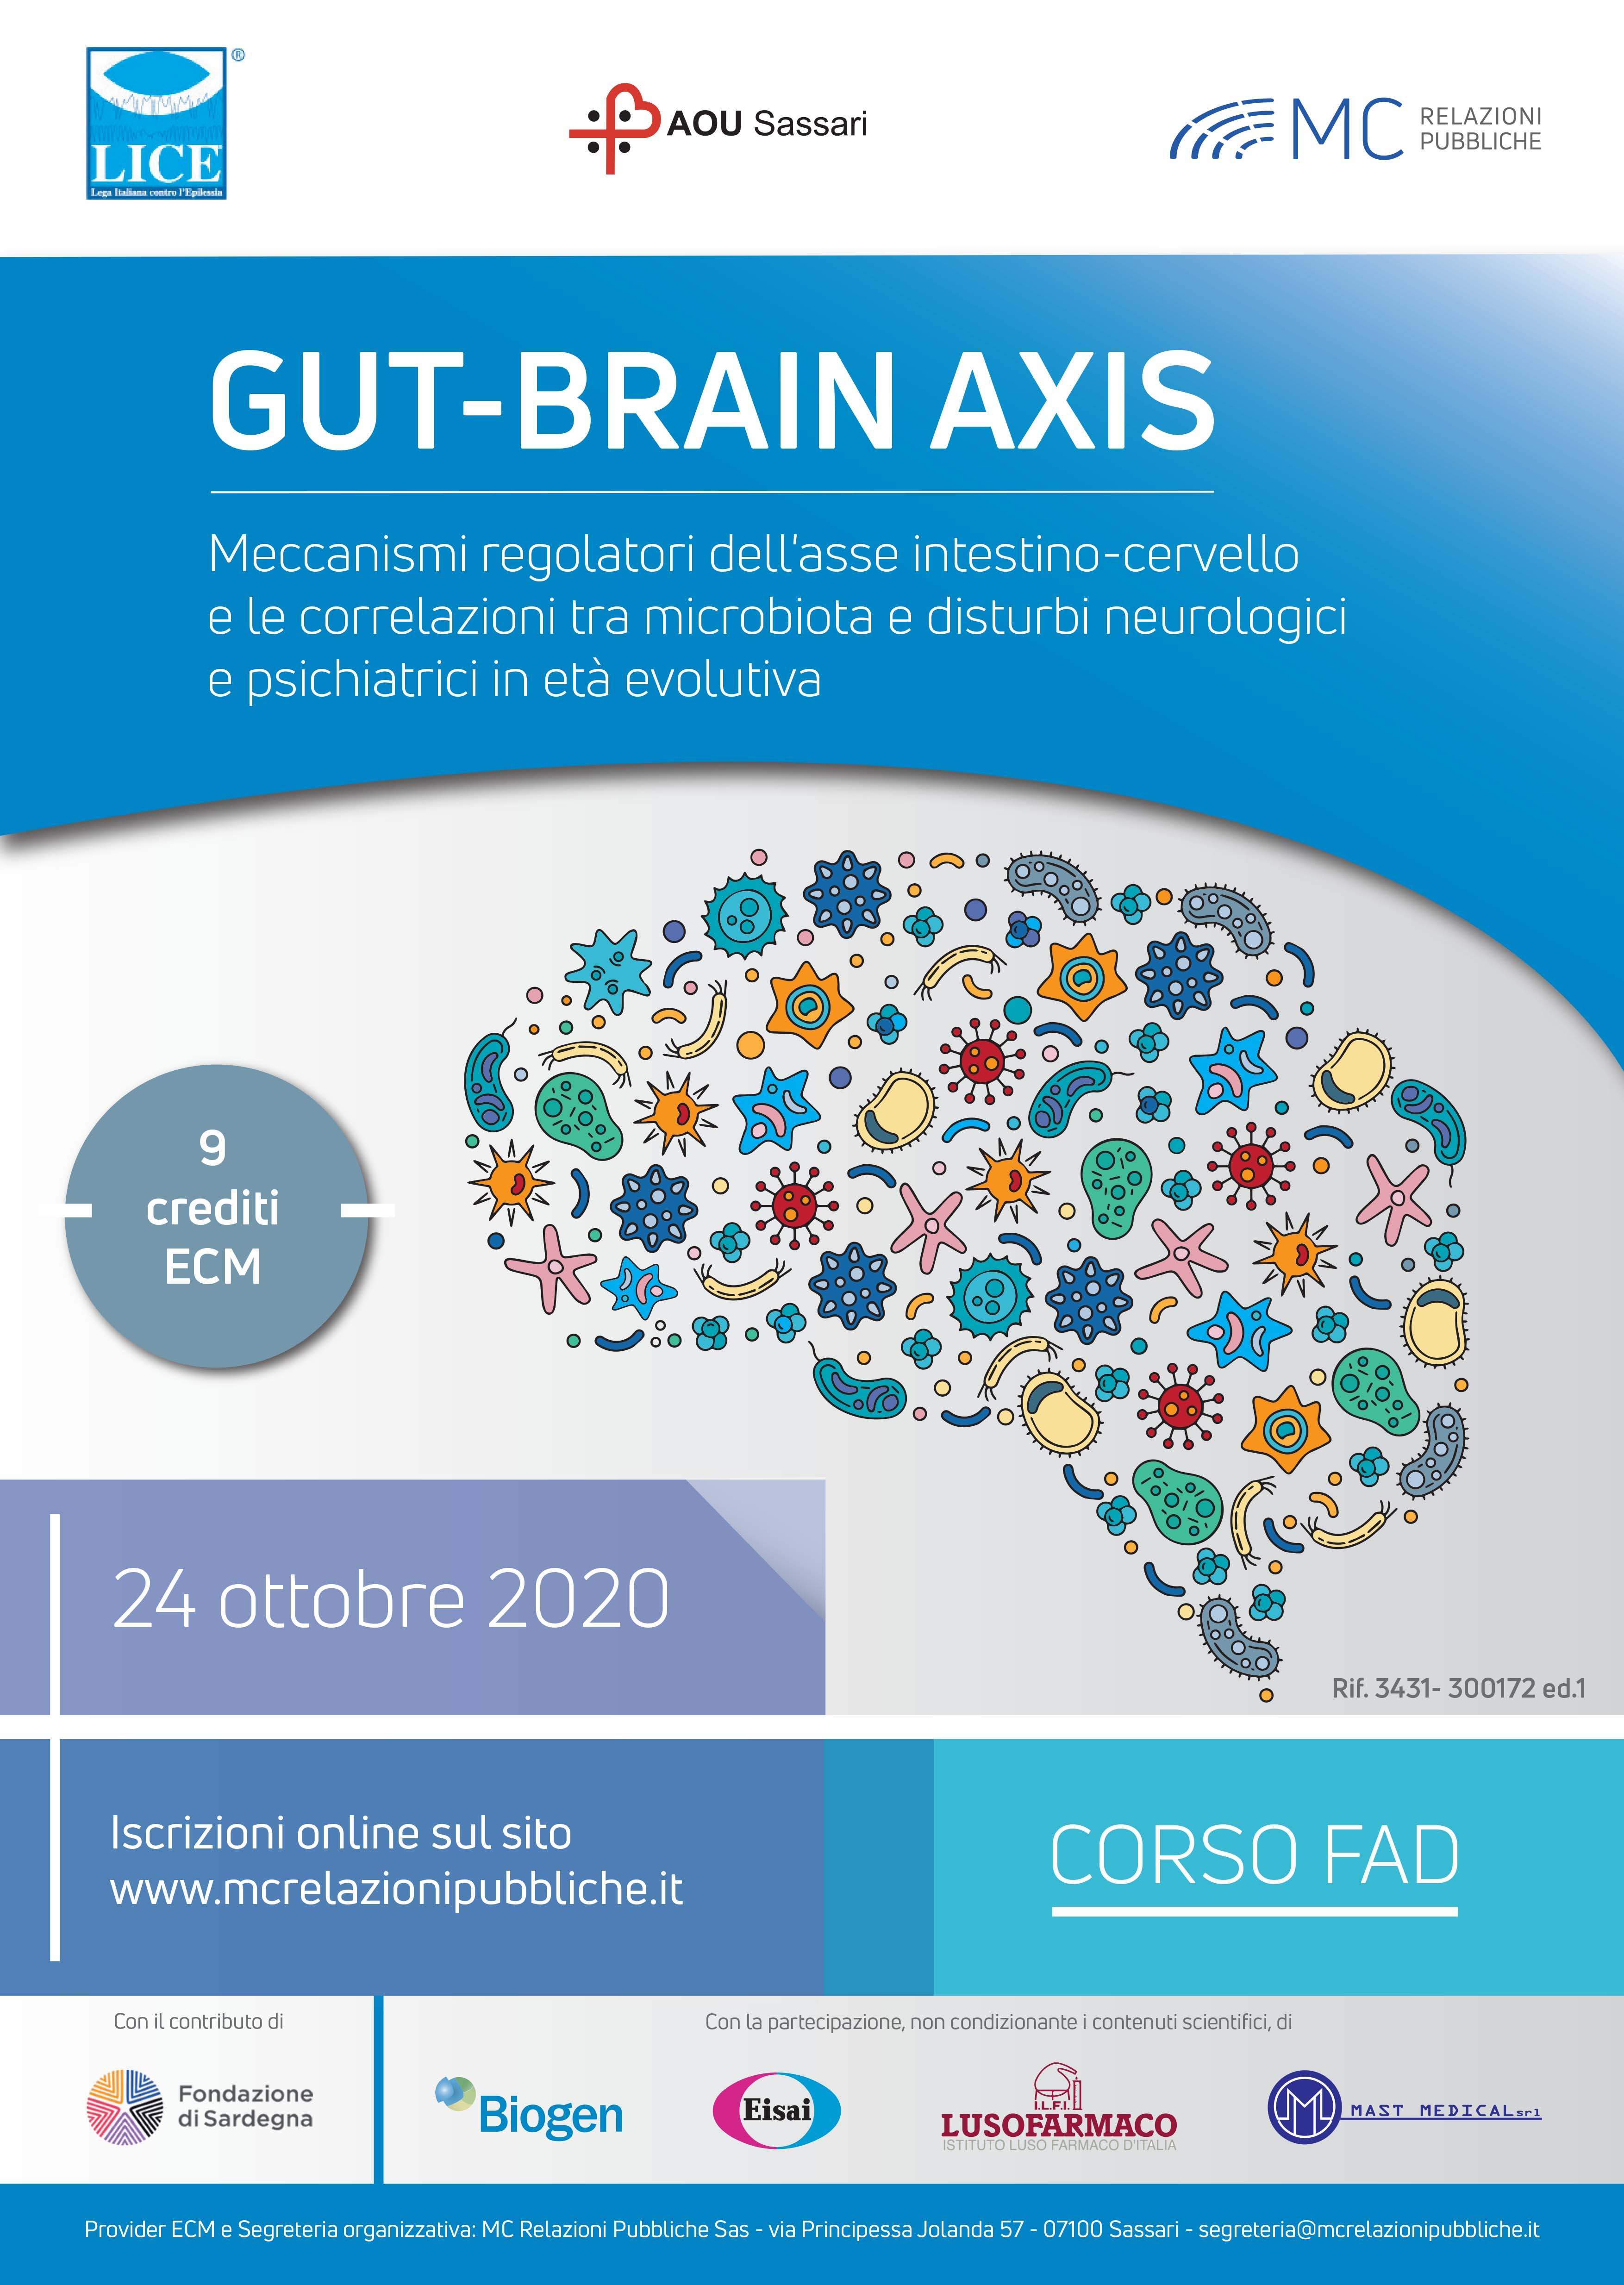 Gut-Brain Axis - 24 ottobre 2020